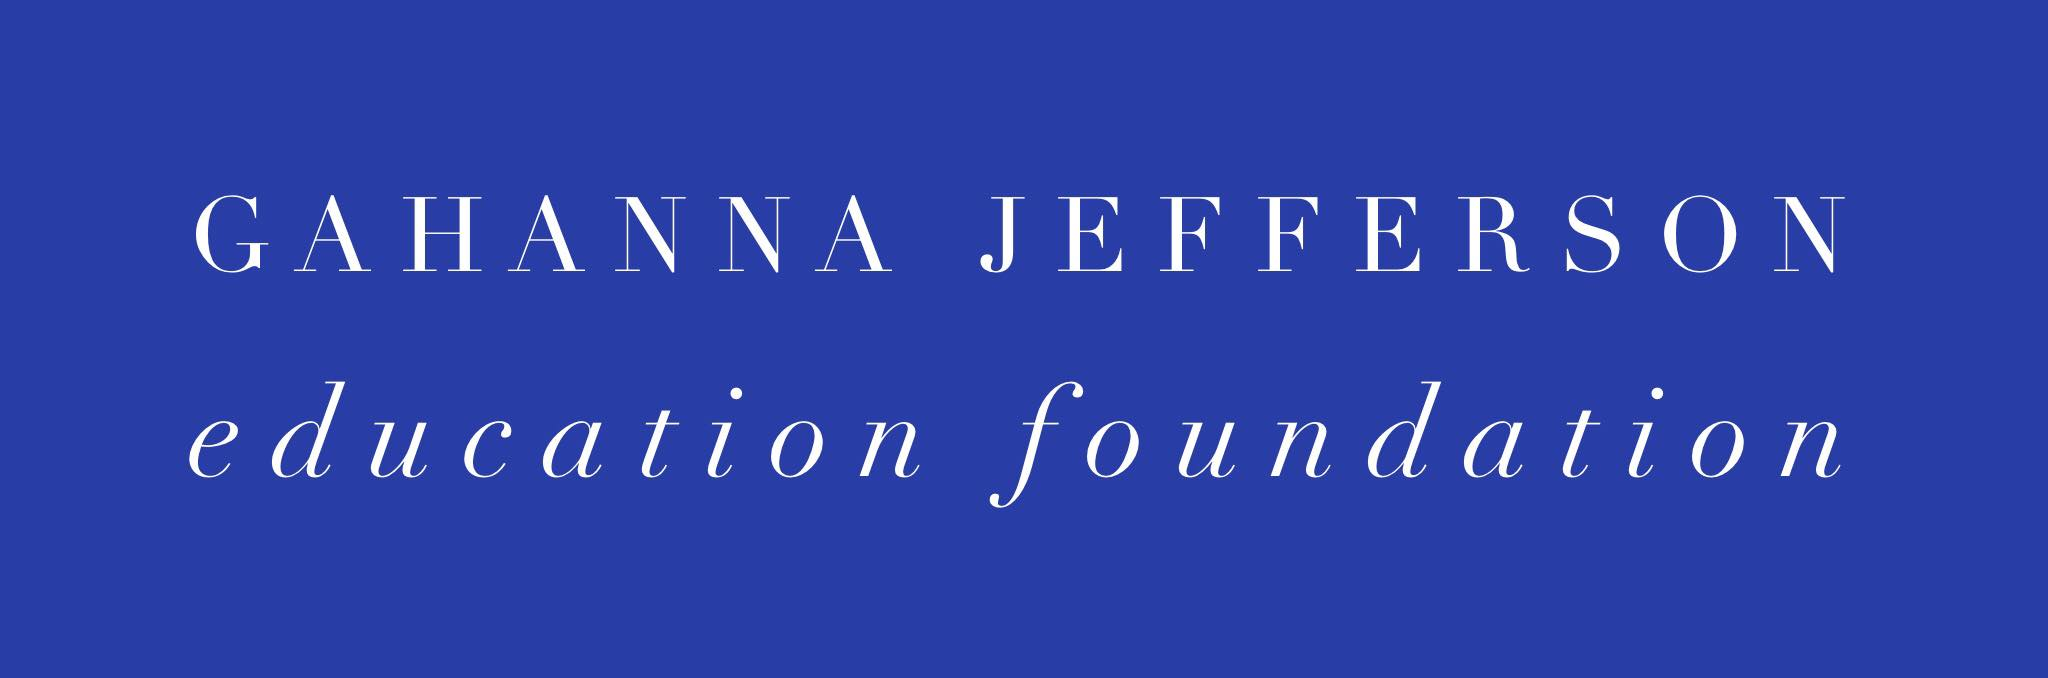 GAHANNA JEFFERSON EDUCATION FOUNDATION